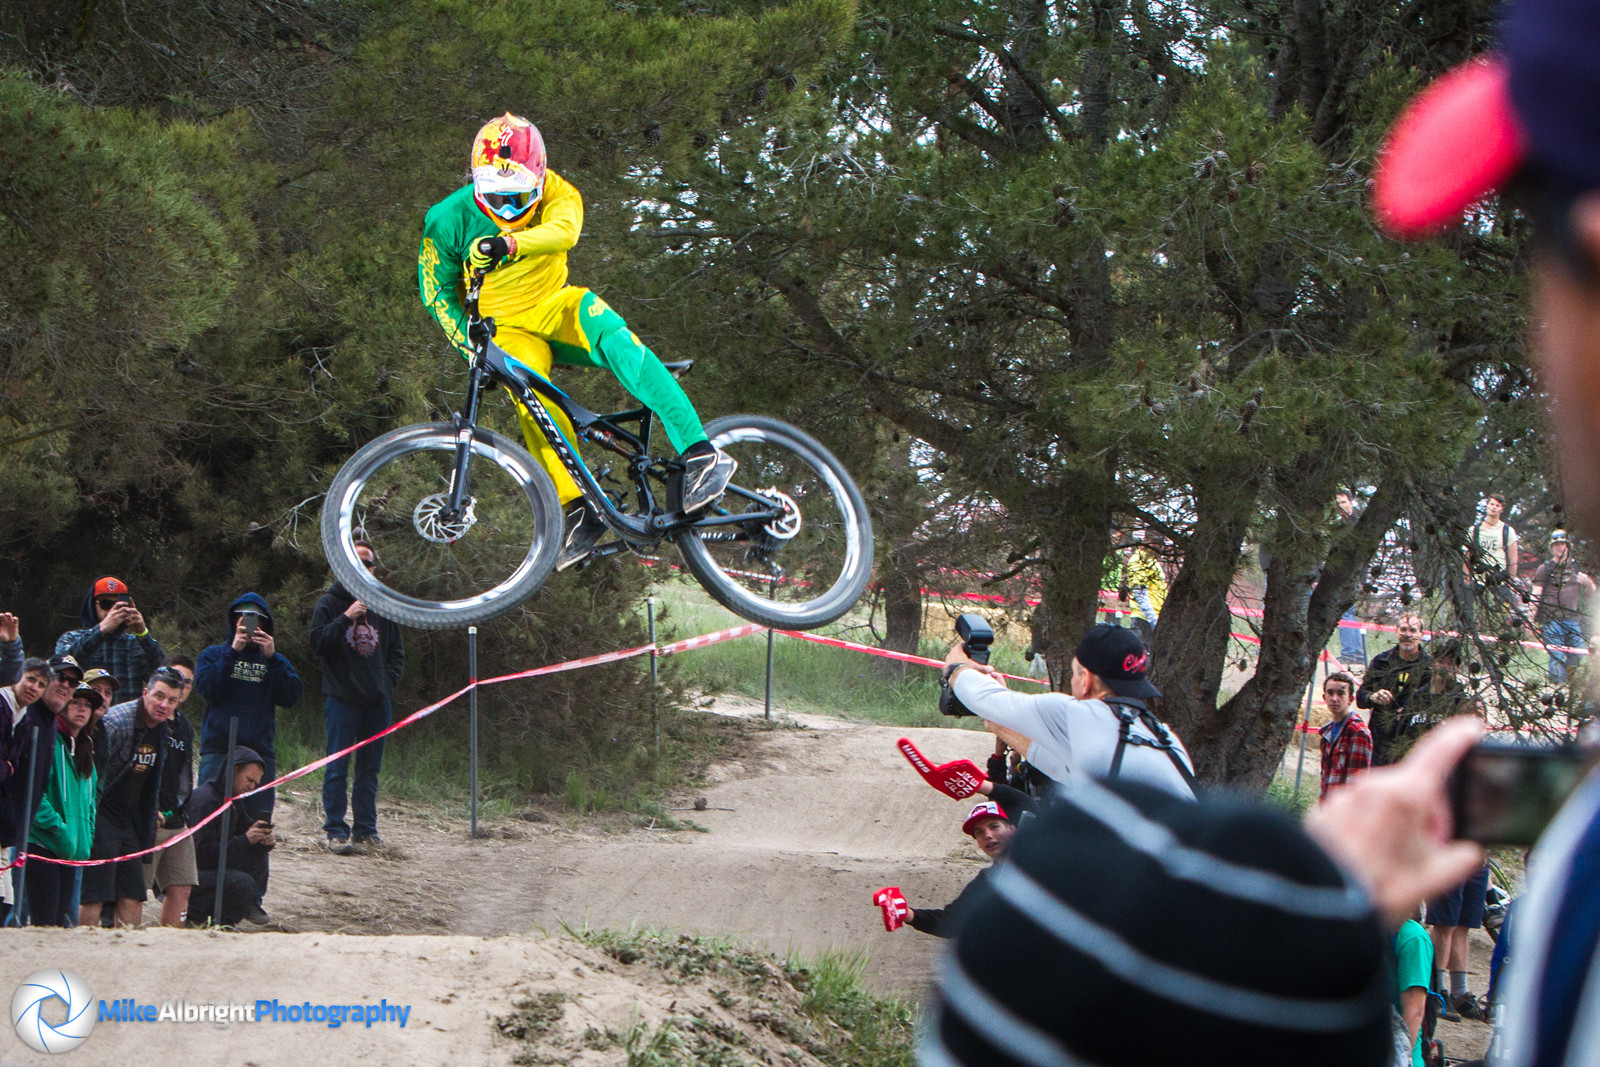 Cody Kelley Whip - albrightphoto - Mountain Biking Pictures - Vital MTB